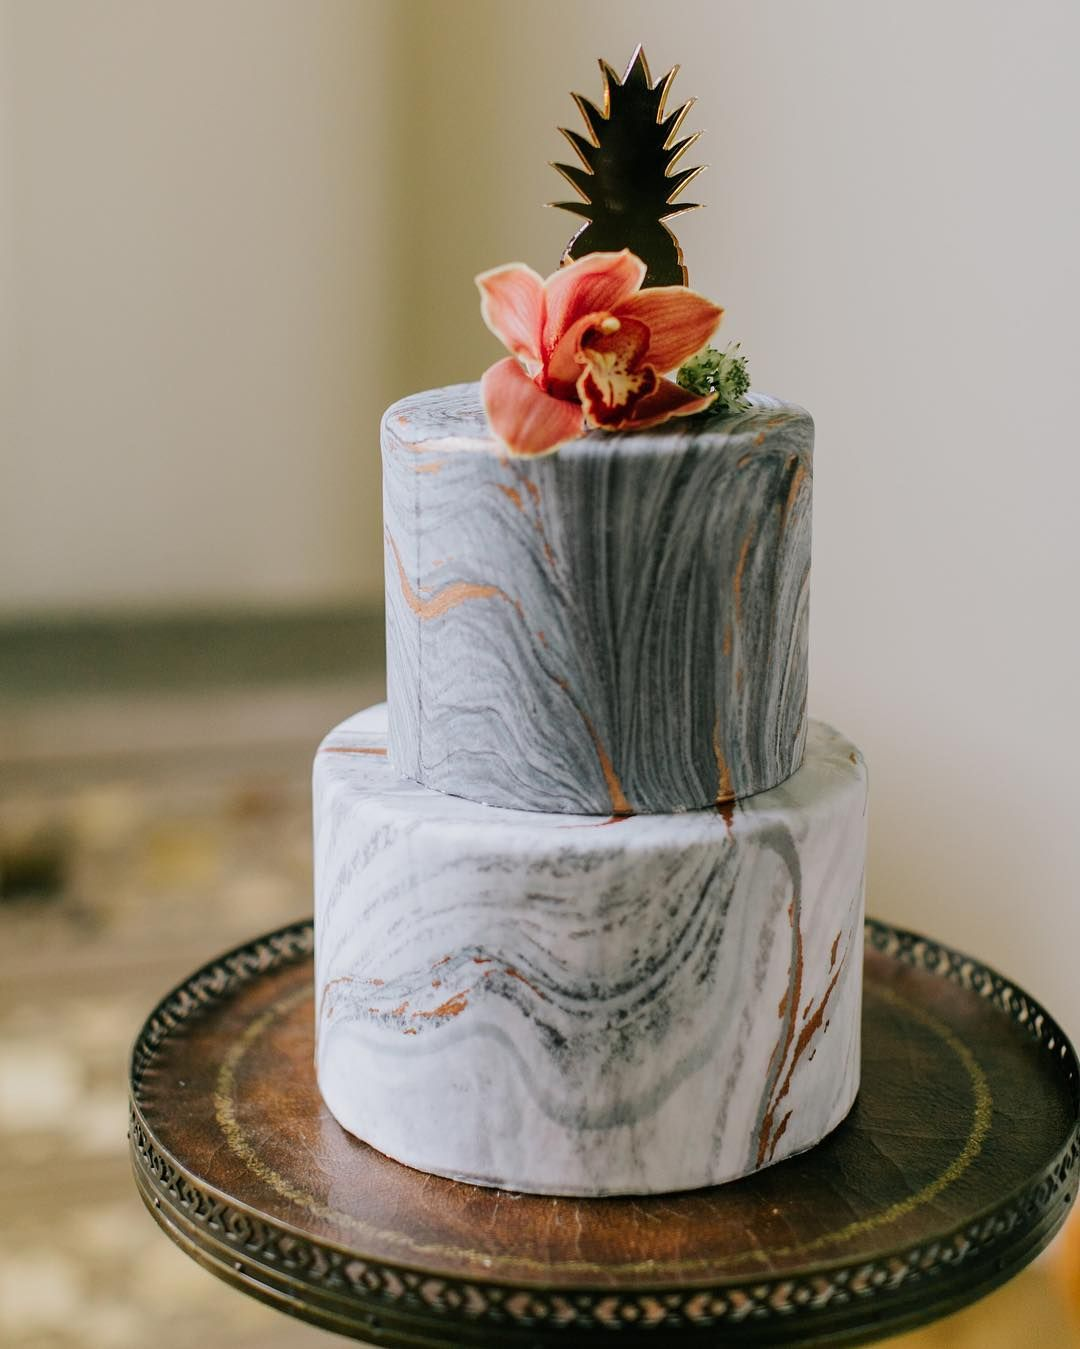 Marbled wedding cake Gateau mariage, Gateau princesse